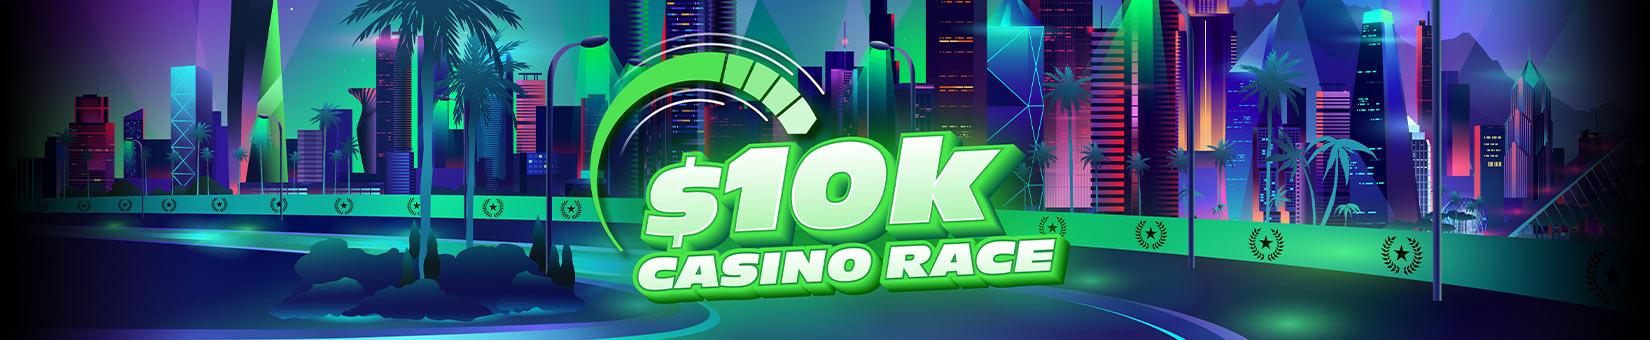 Casino races today best slot machine bonus rounds